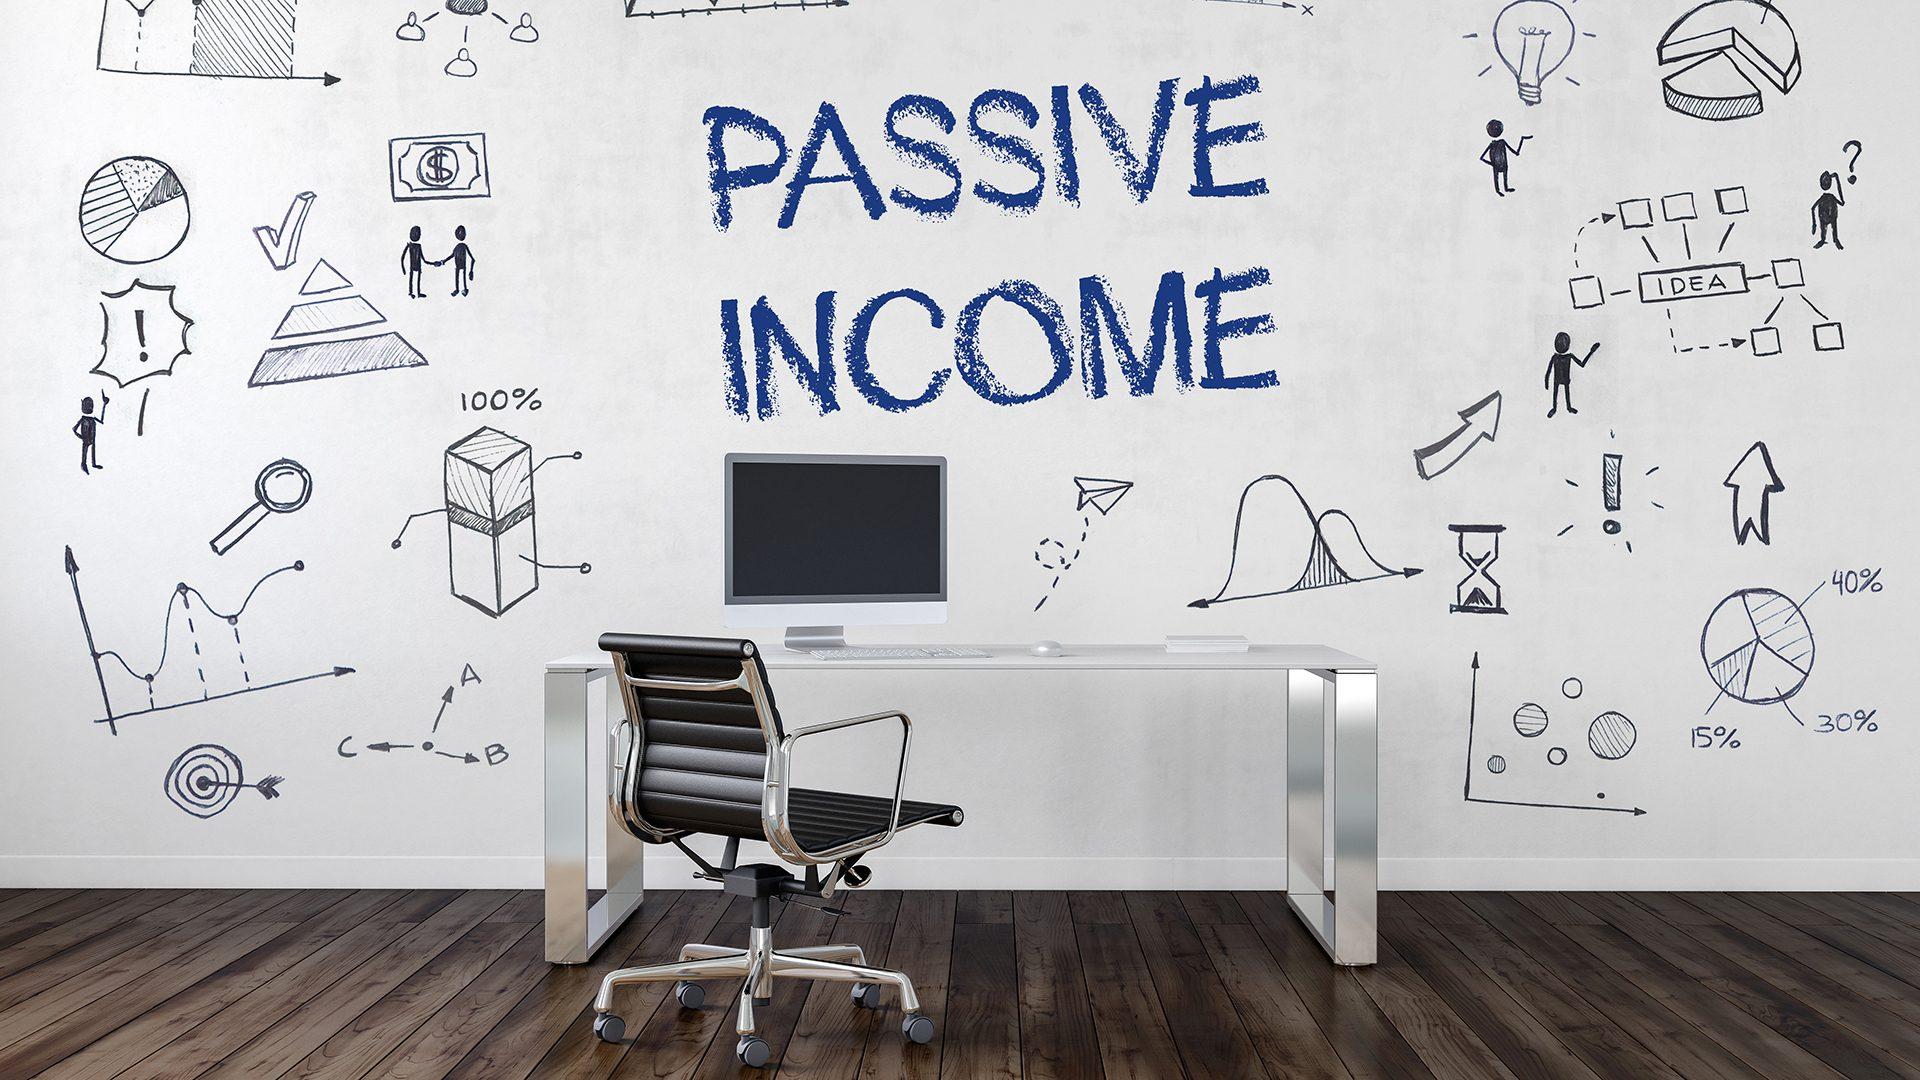 5 Steps to Passive Income 2020